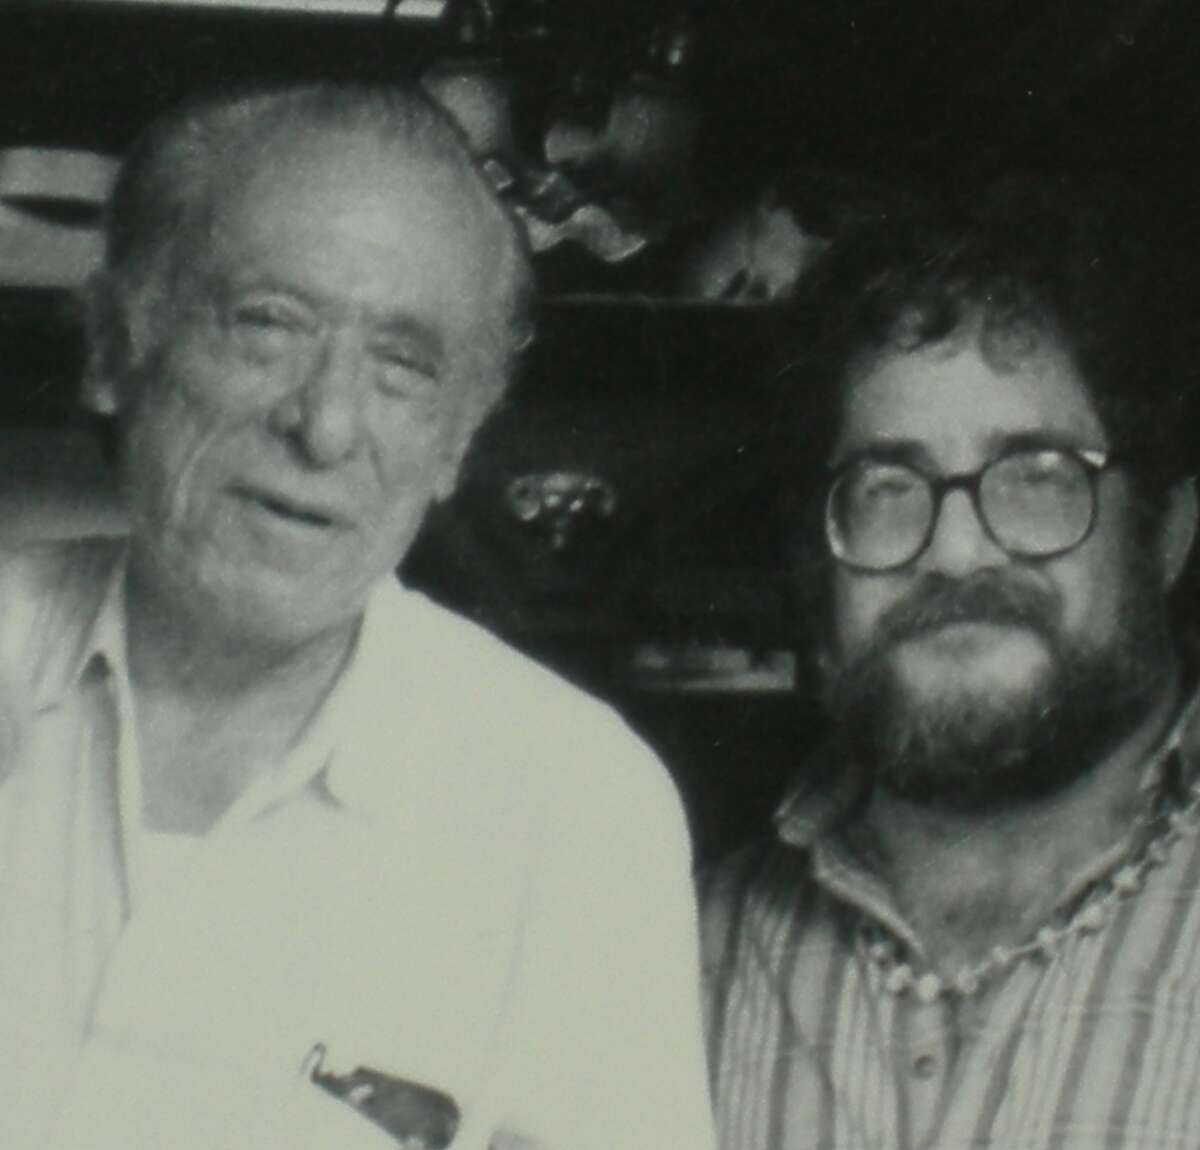 Bukowski with Cherkovski